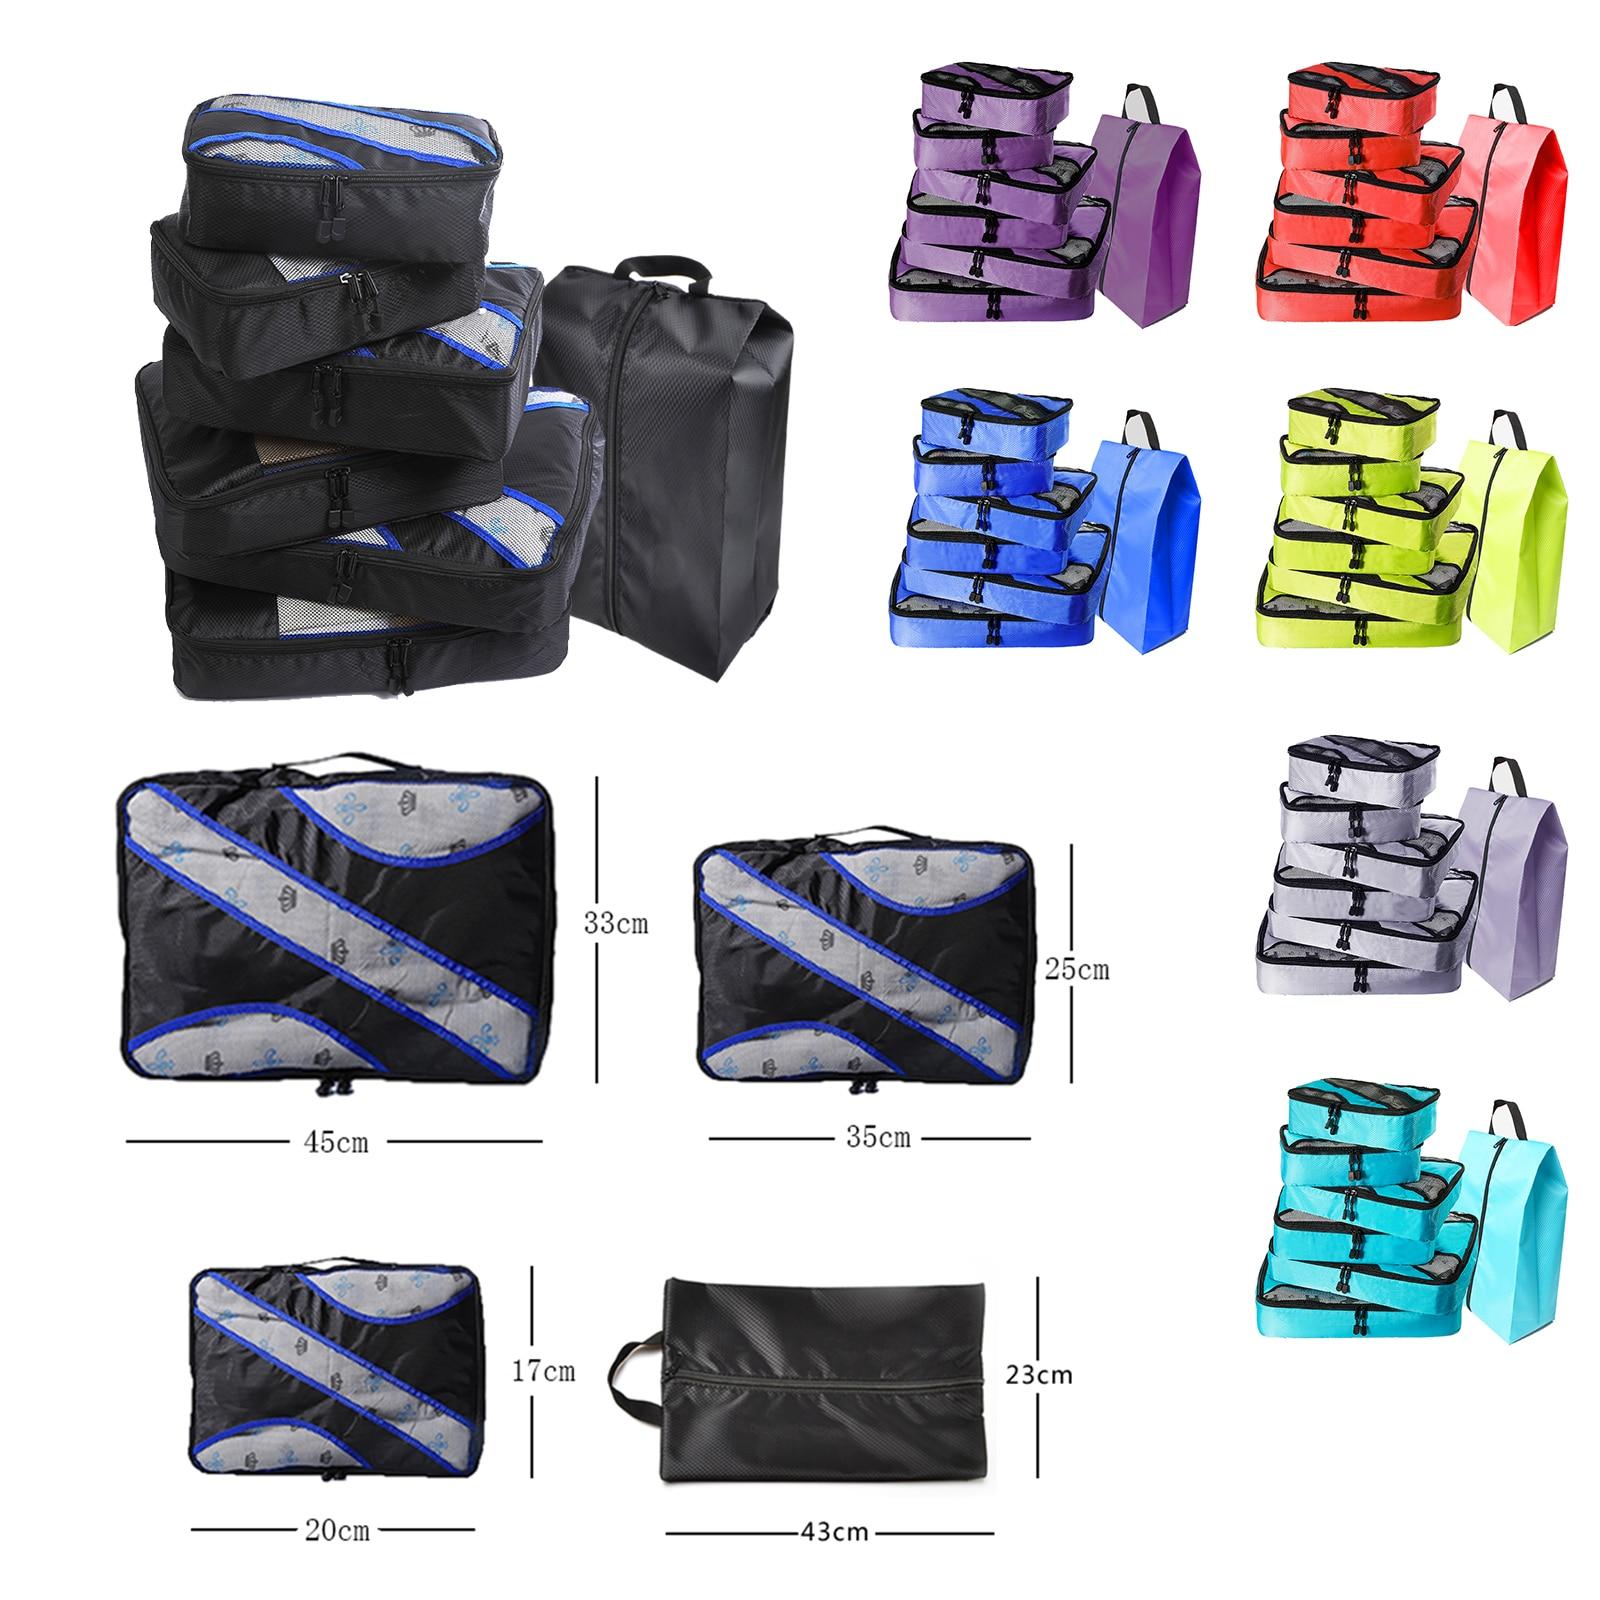 Luggage Packing Cube Nylon/Women/Big/Ladies/Large/Waterproof/Travel Bags Organizer Sets Packing Cube Organizer Duffle Bag